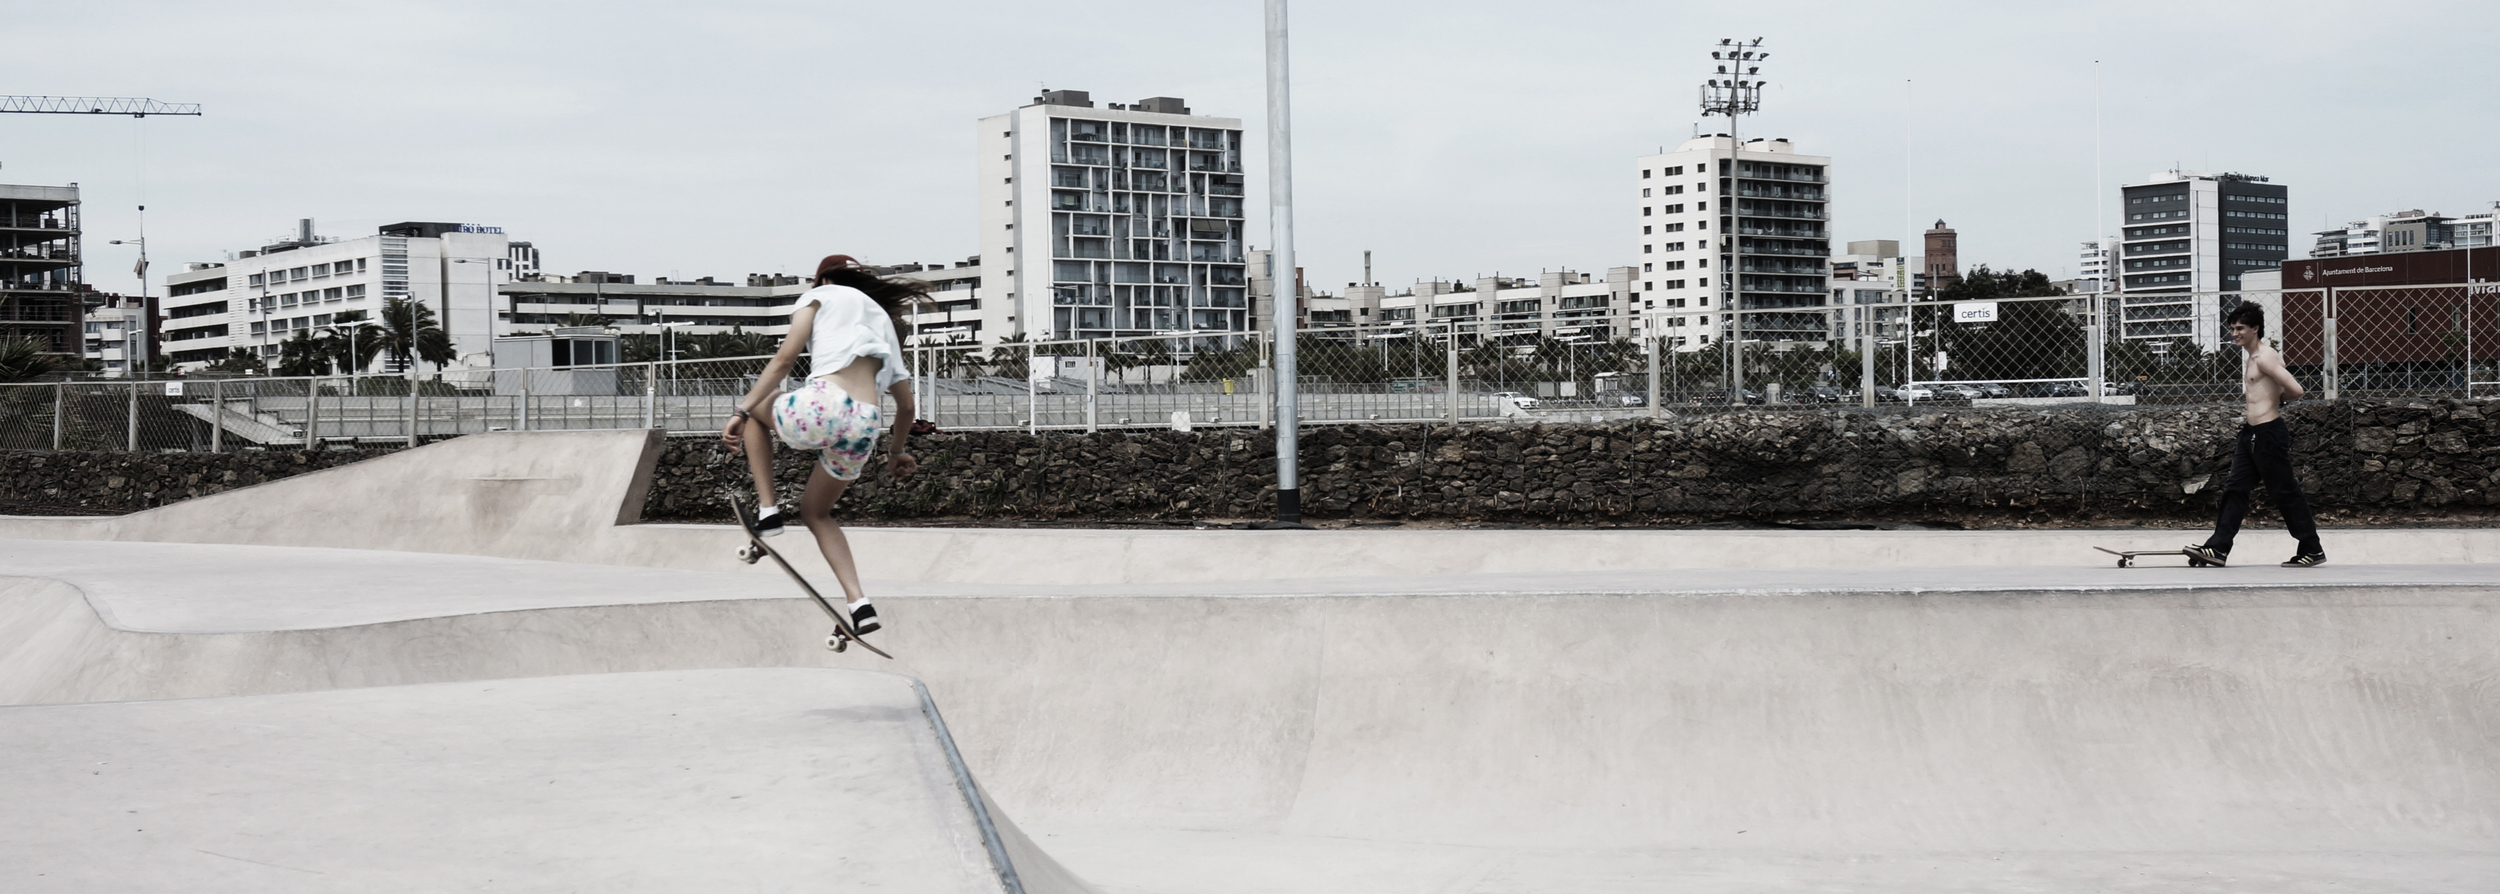 Skate park at Marbella, Barcelona:An example of a static urbanenvironment.